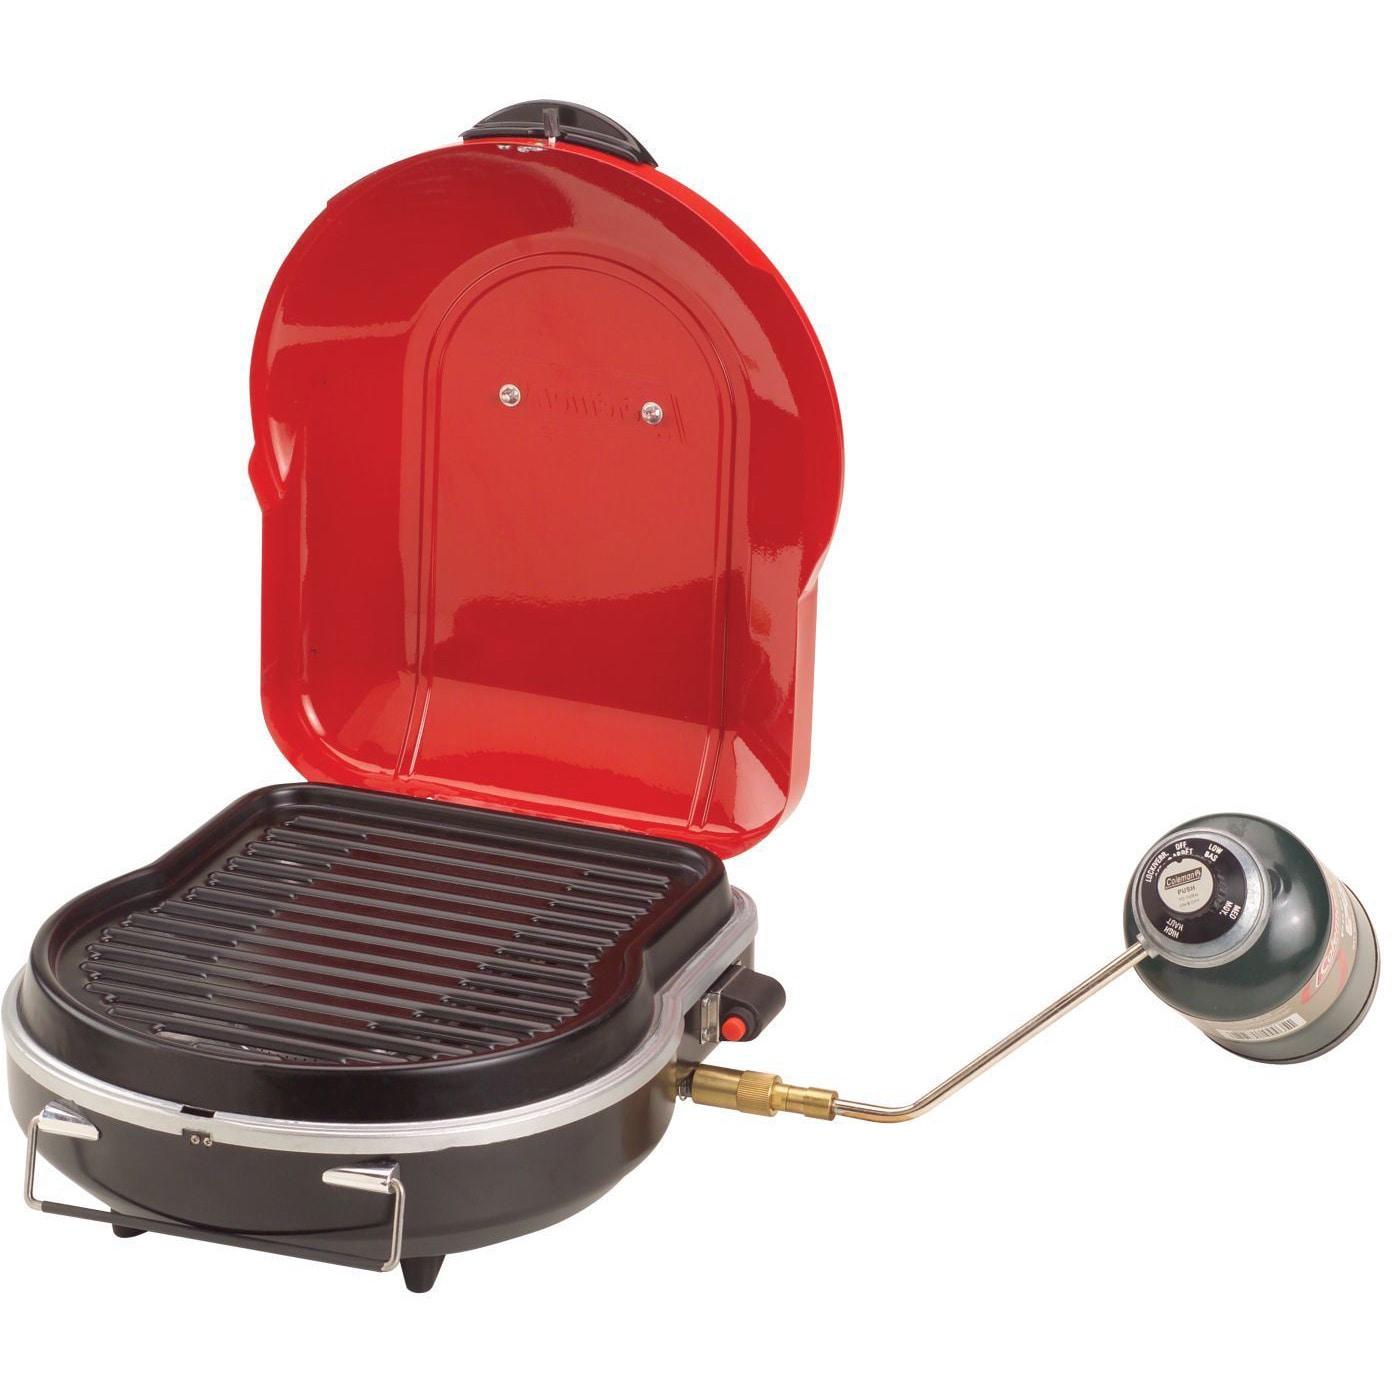 Coleman Fold-N-Go Propane Grill 1 Burner (Red)